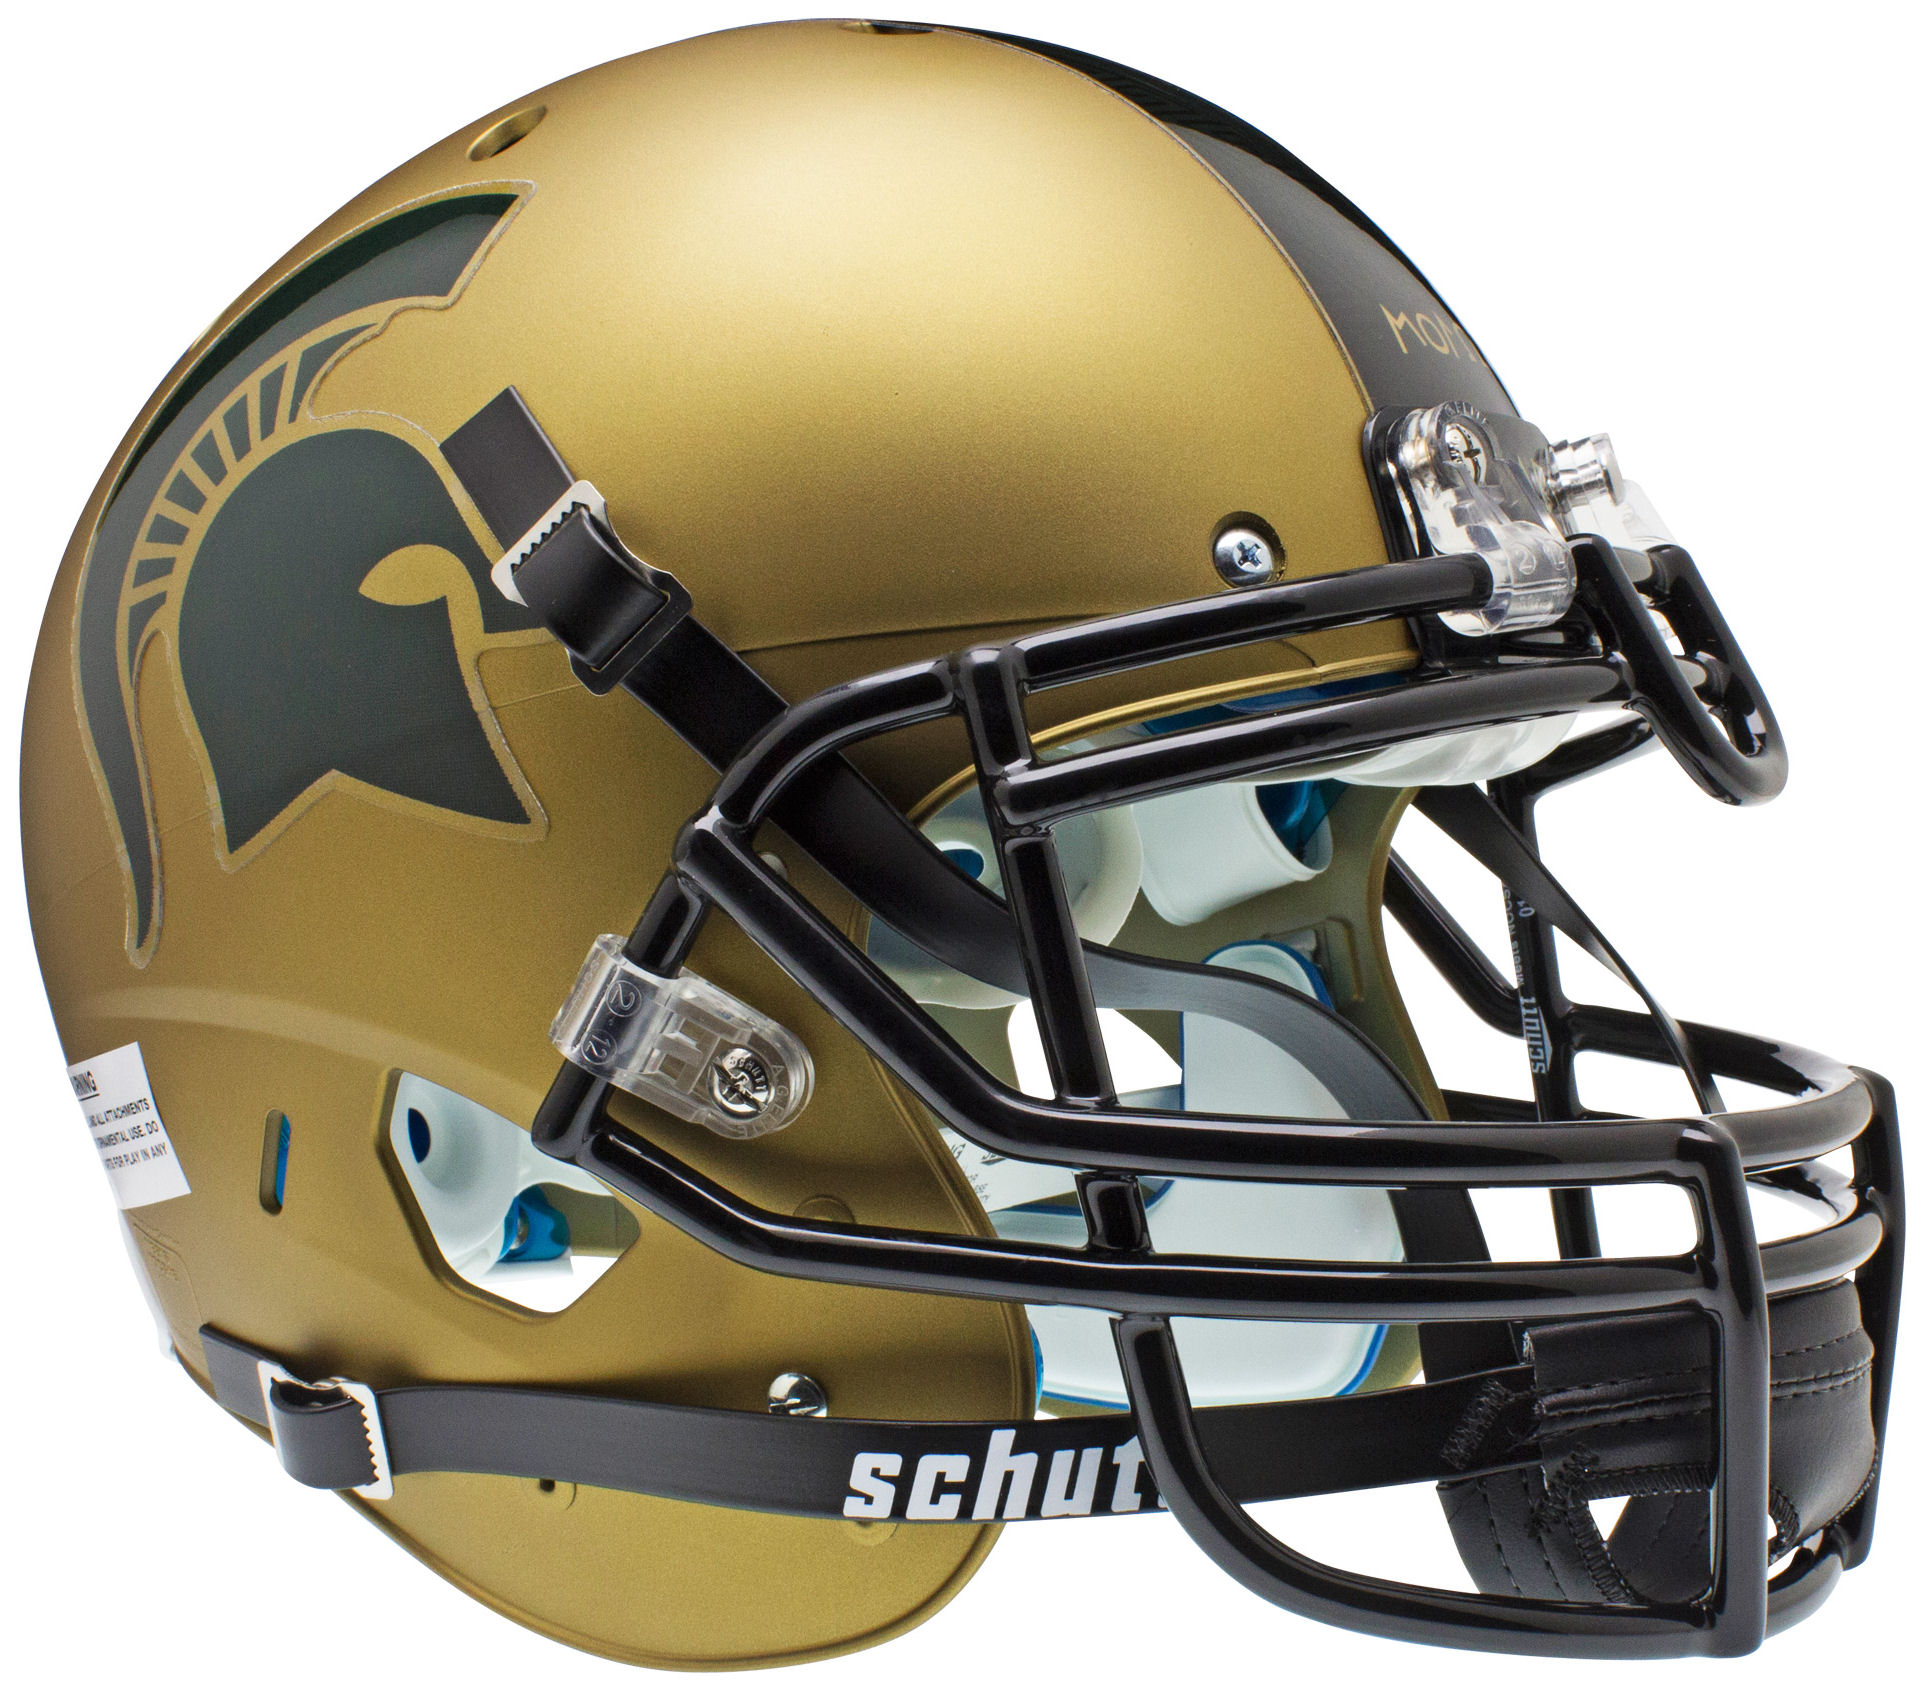 Michigan State Spartans Authentic Schutt Xp Full Size Helmet Gold By Schutt Game Day Trea Football Helmets Michigan State Spartans College Football Helmets